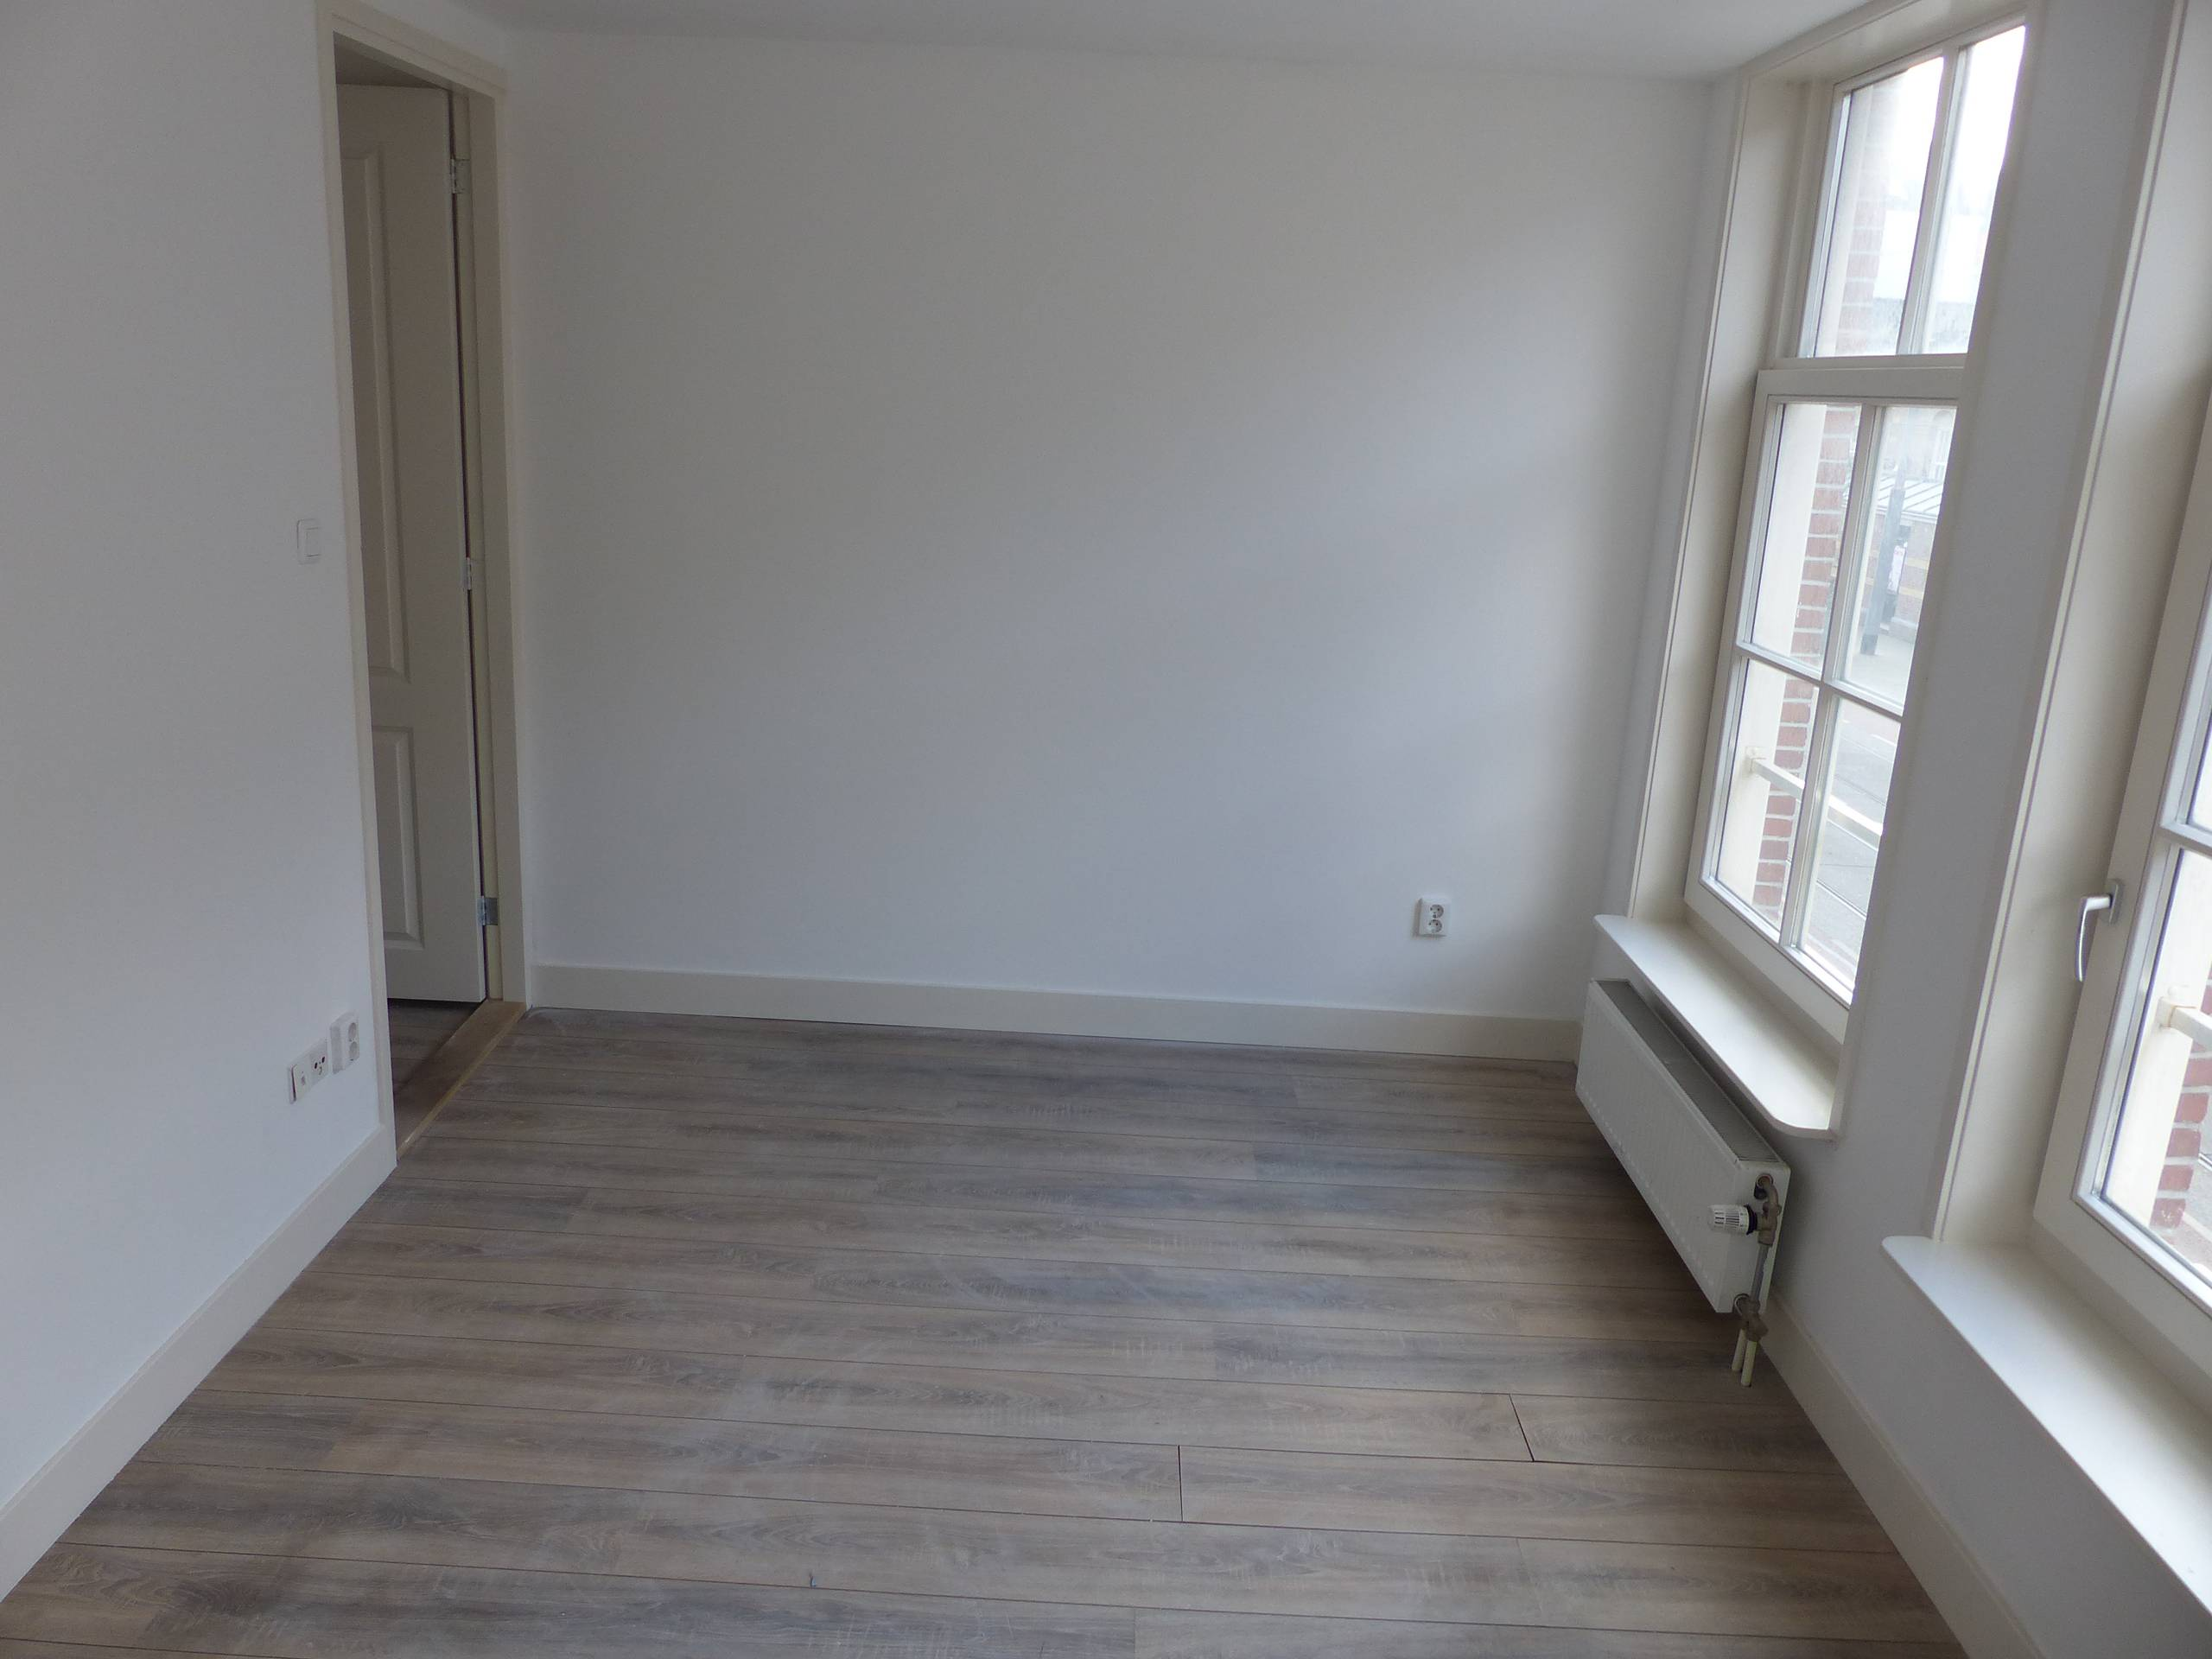 Marnixstraat 257 III, Amsterdam